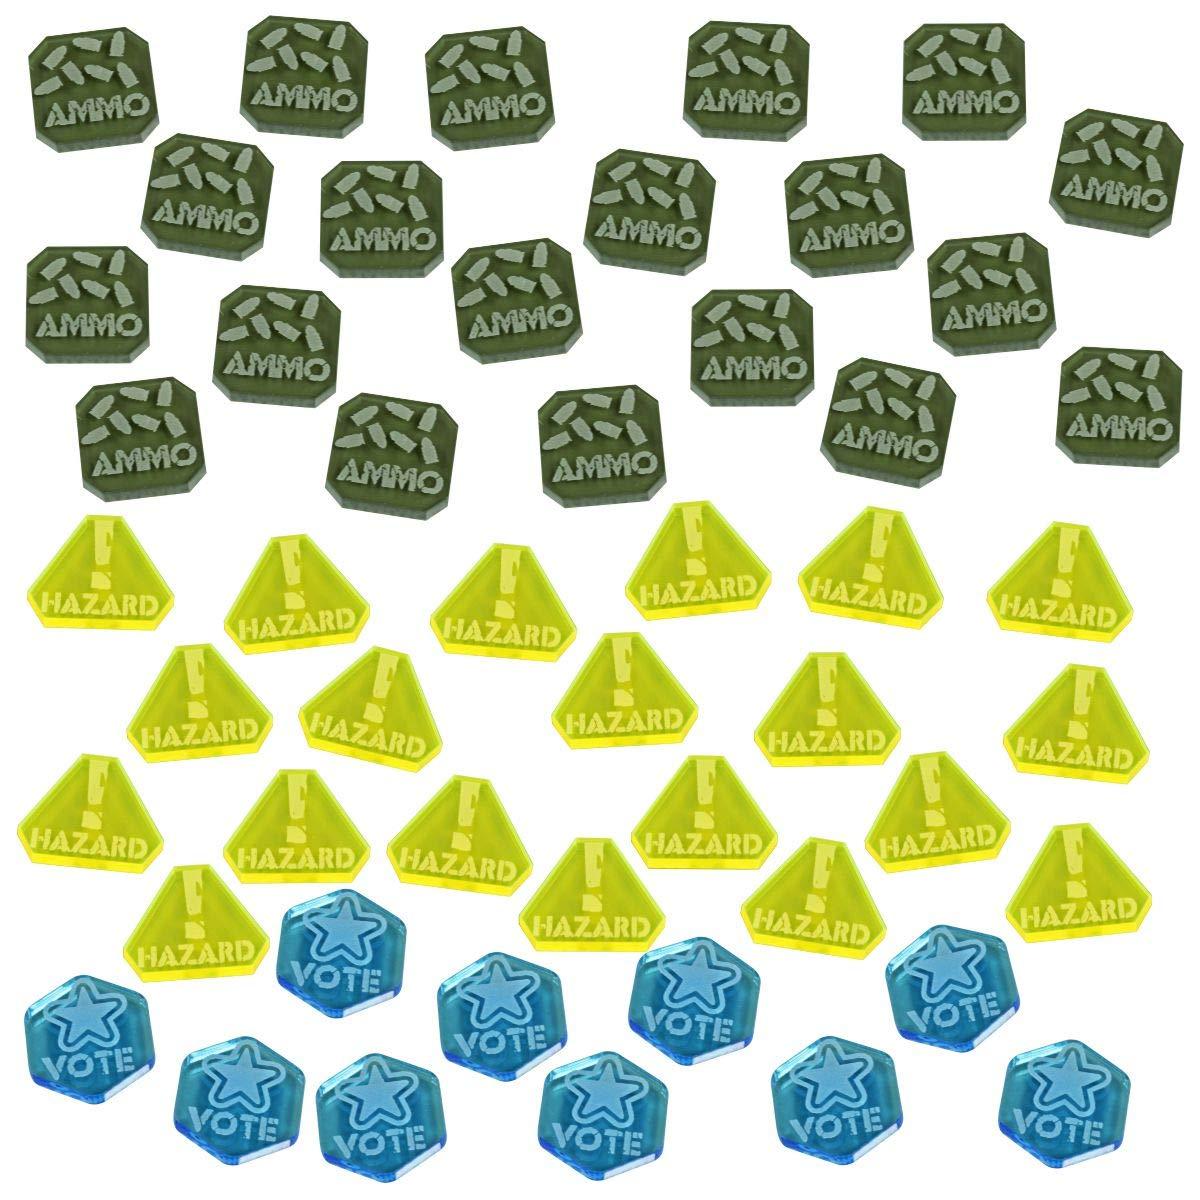 Gaslands Miniatures Game Token Set, Multi-Colored (50)